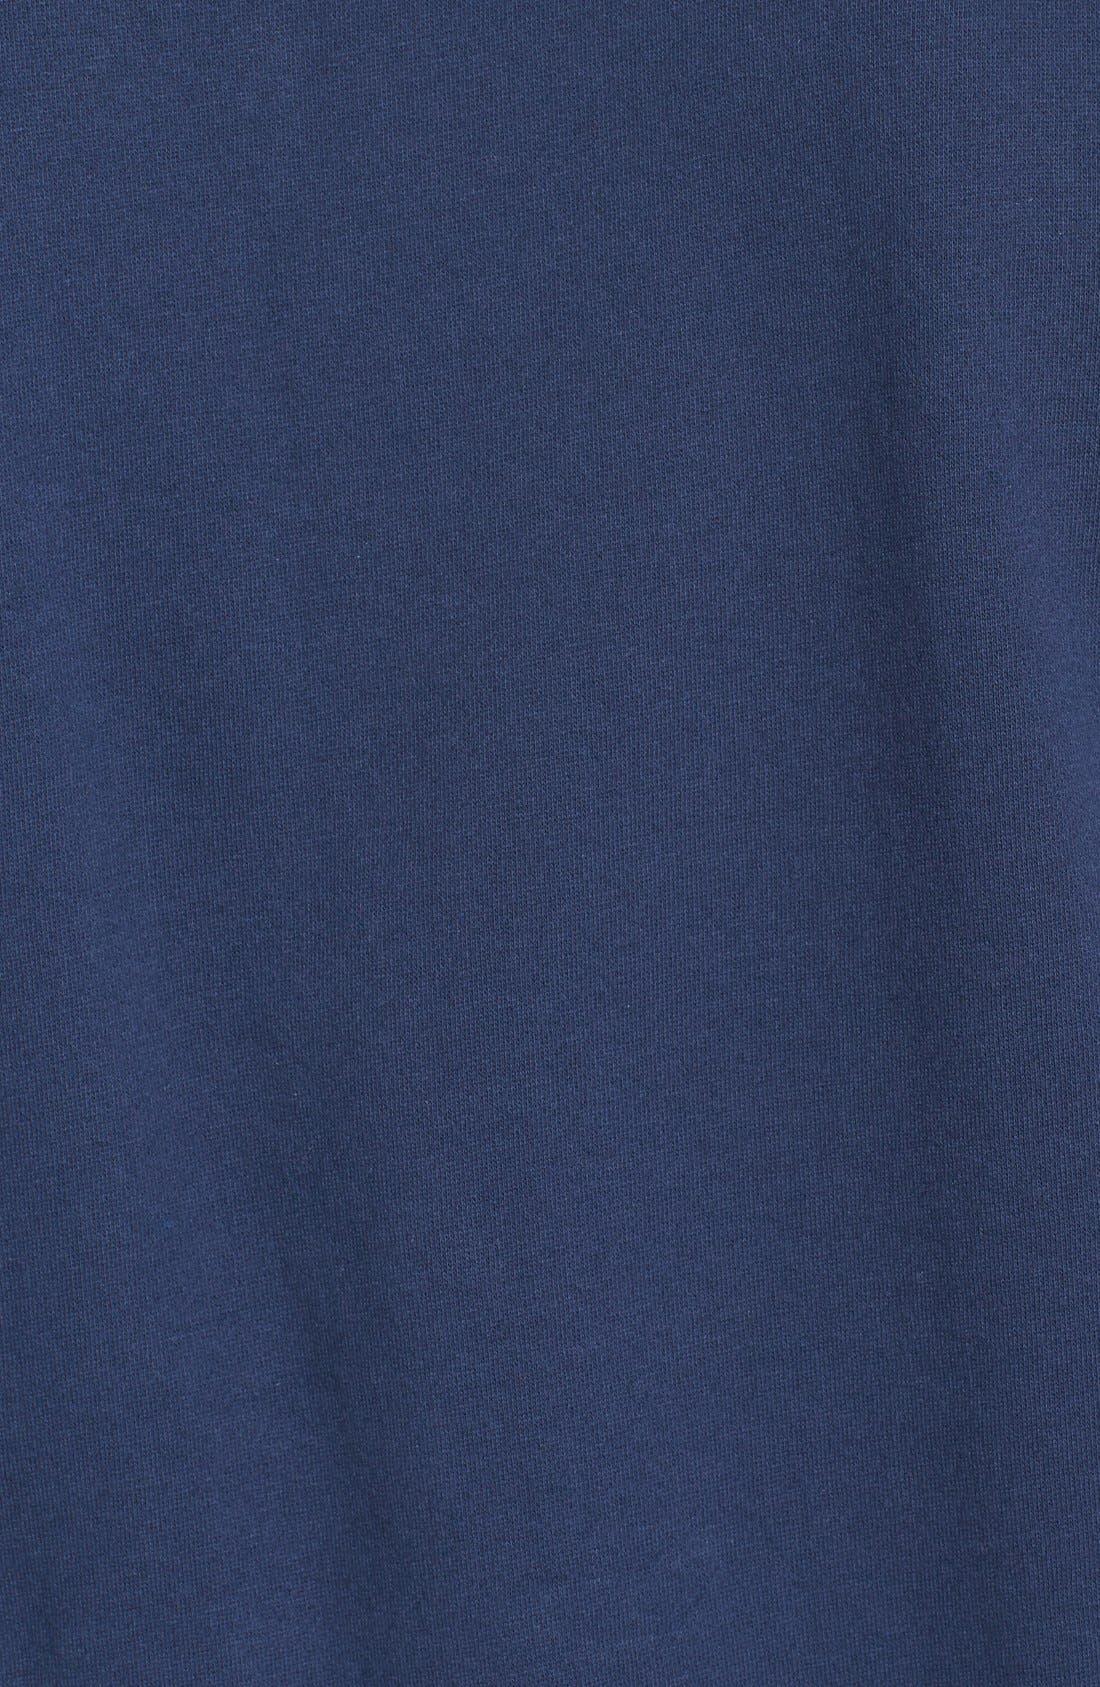 Alternate Image 3  - Mitchell & Ness 'Detroit Tigers' Crewneck Sweatshirt